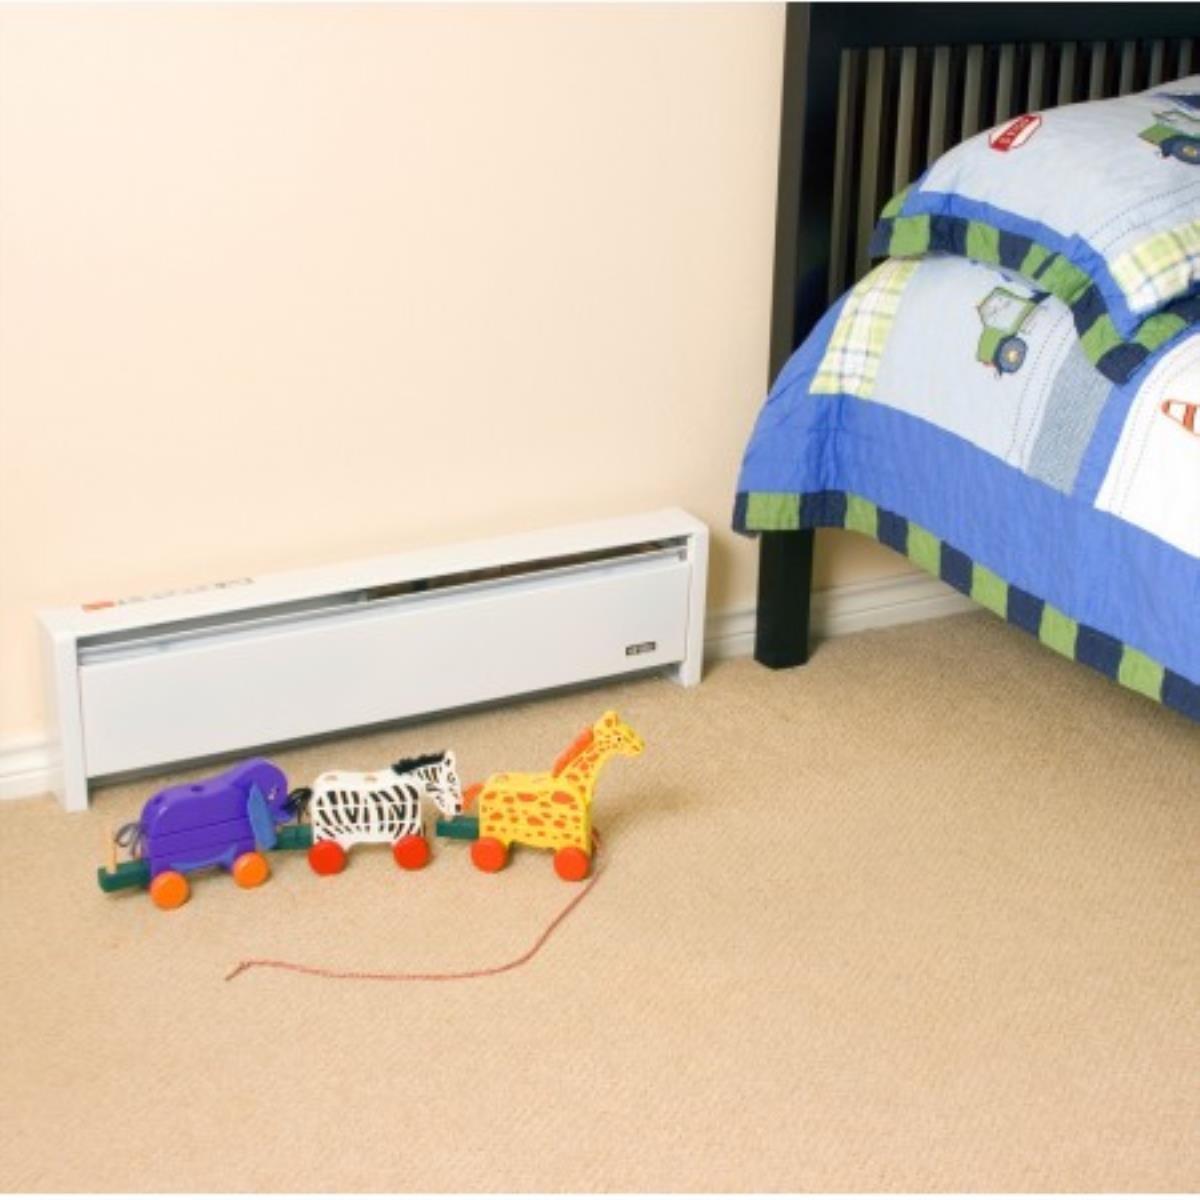 Cadet Ebhn1500wslh Softheat Hydronic Baseboard Heater Heaters Rough Wiring